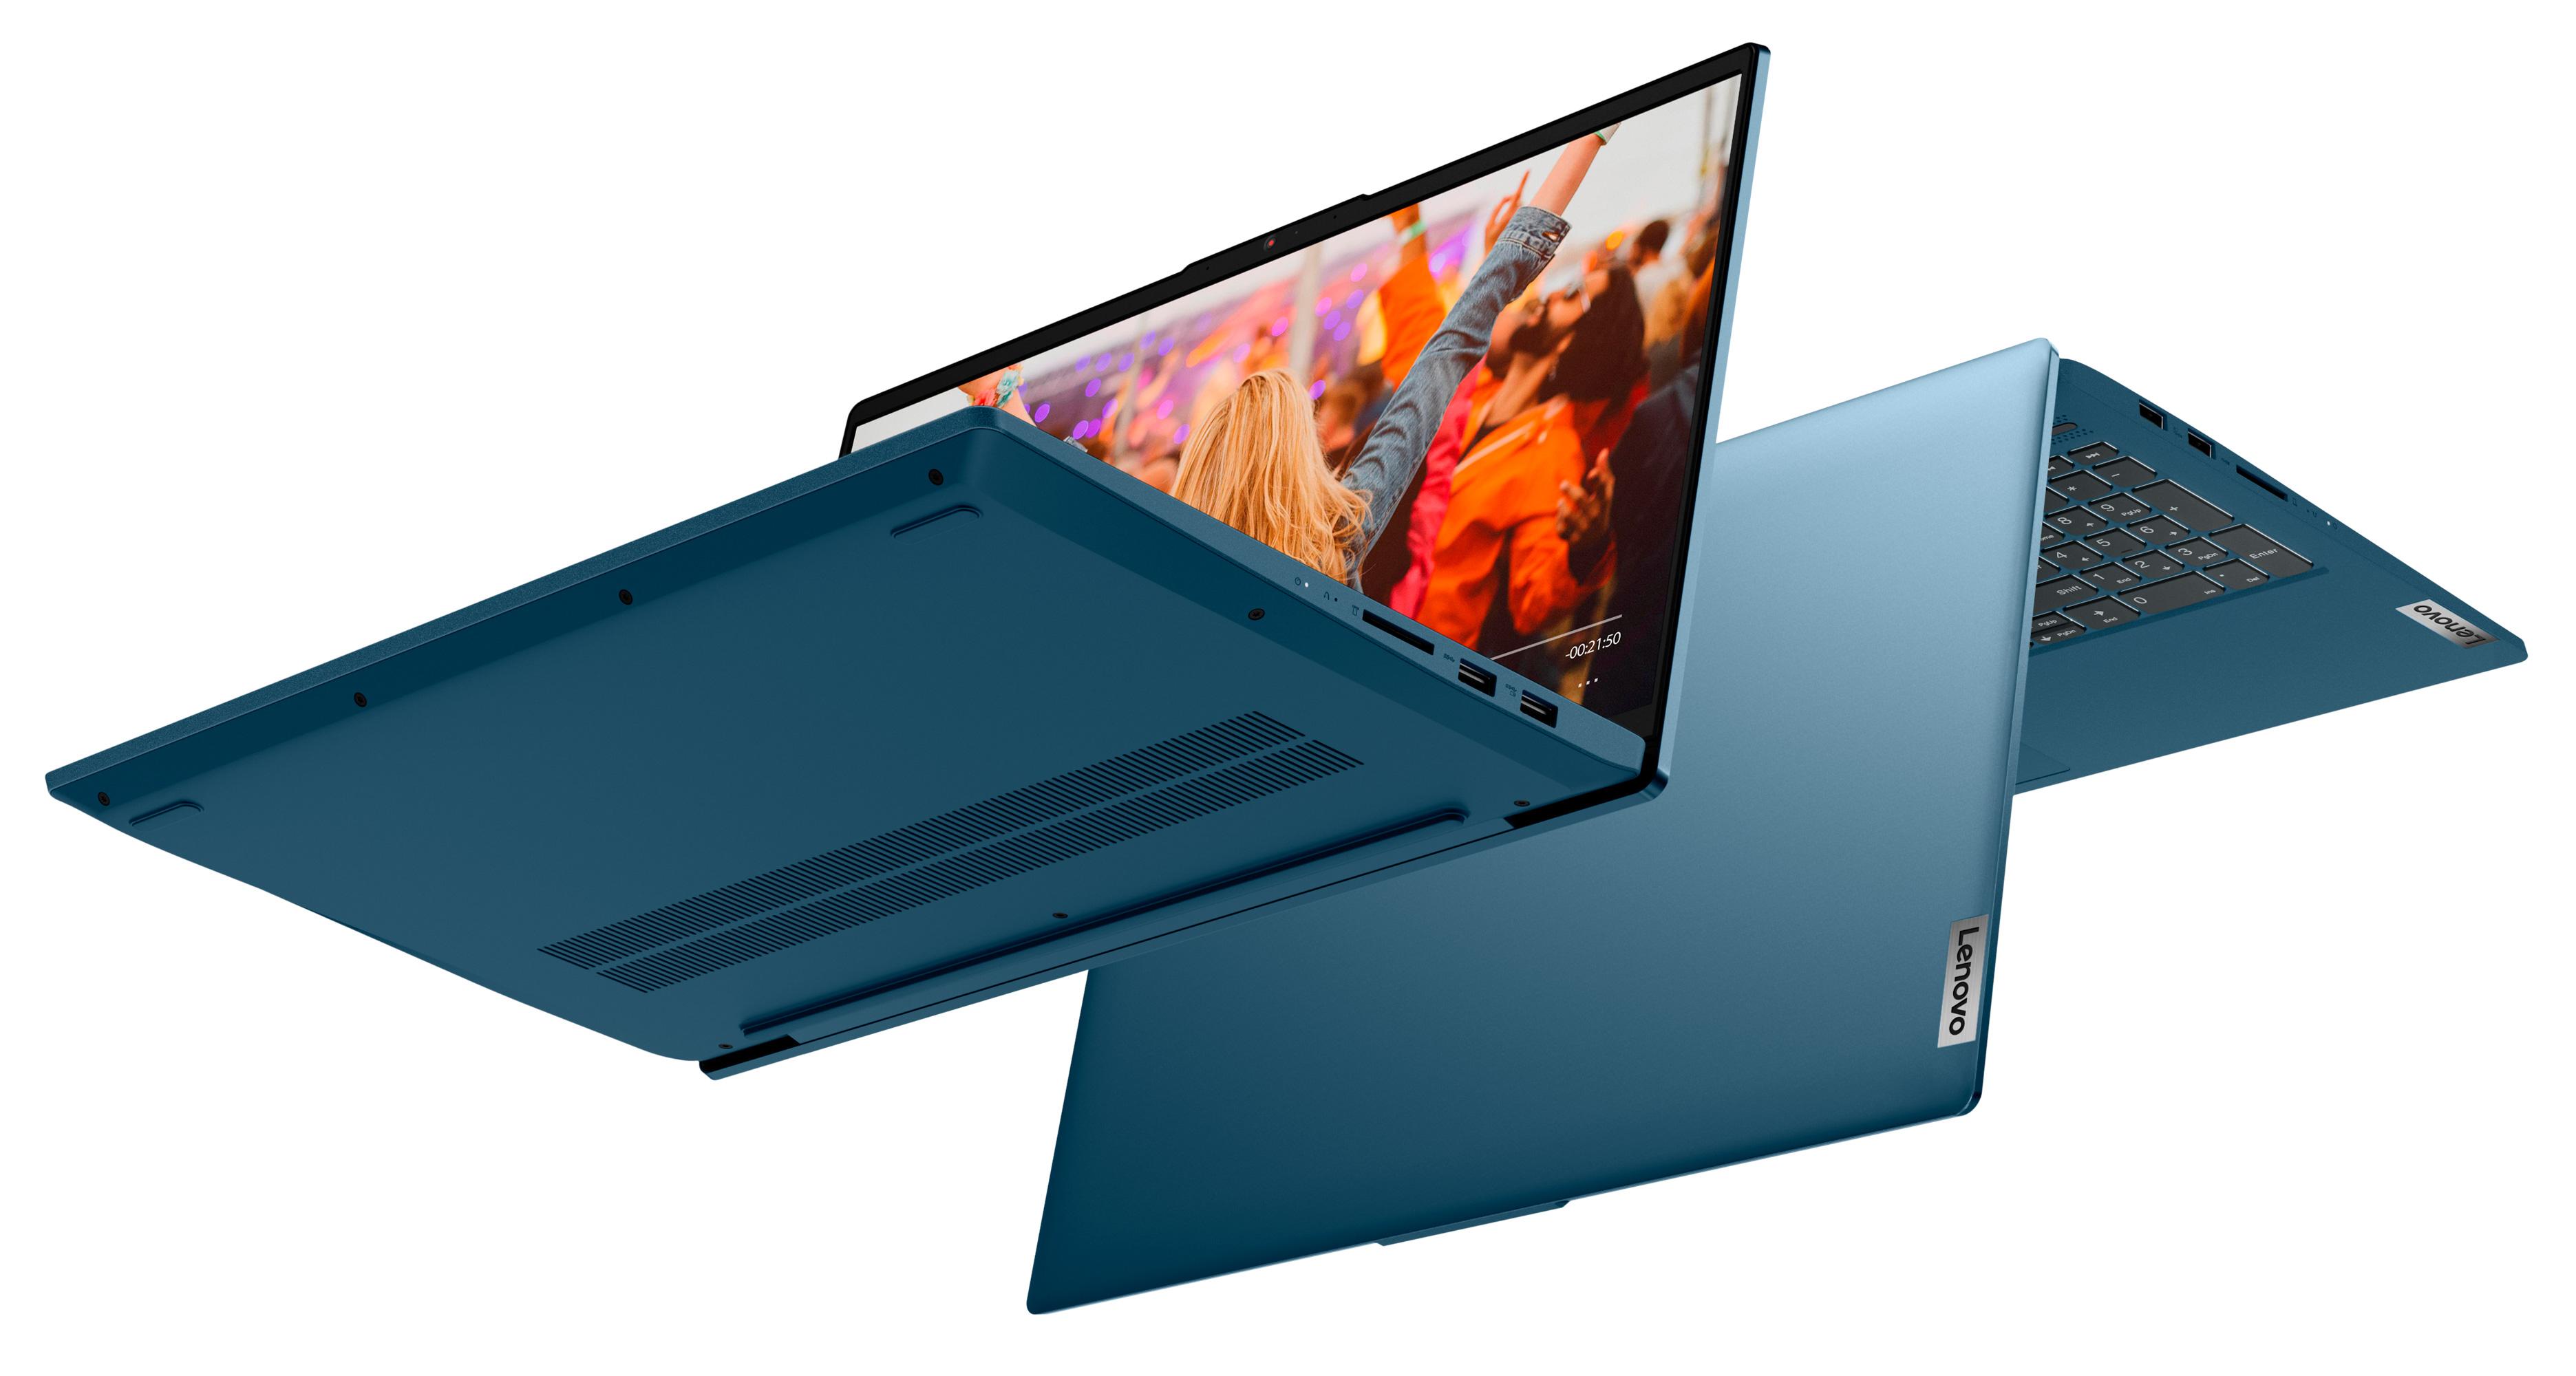 Фото  Ноутбук Lenovo ideapad 5i 15IIL05 Light Teal (81YK00G9RE)